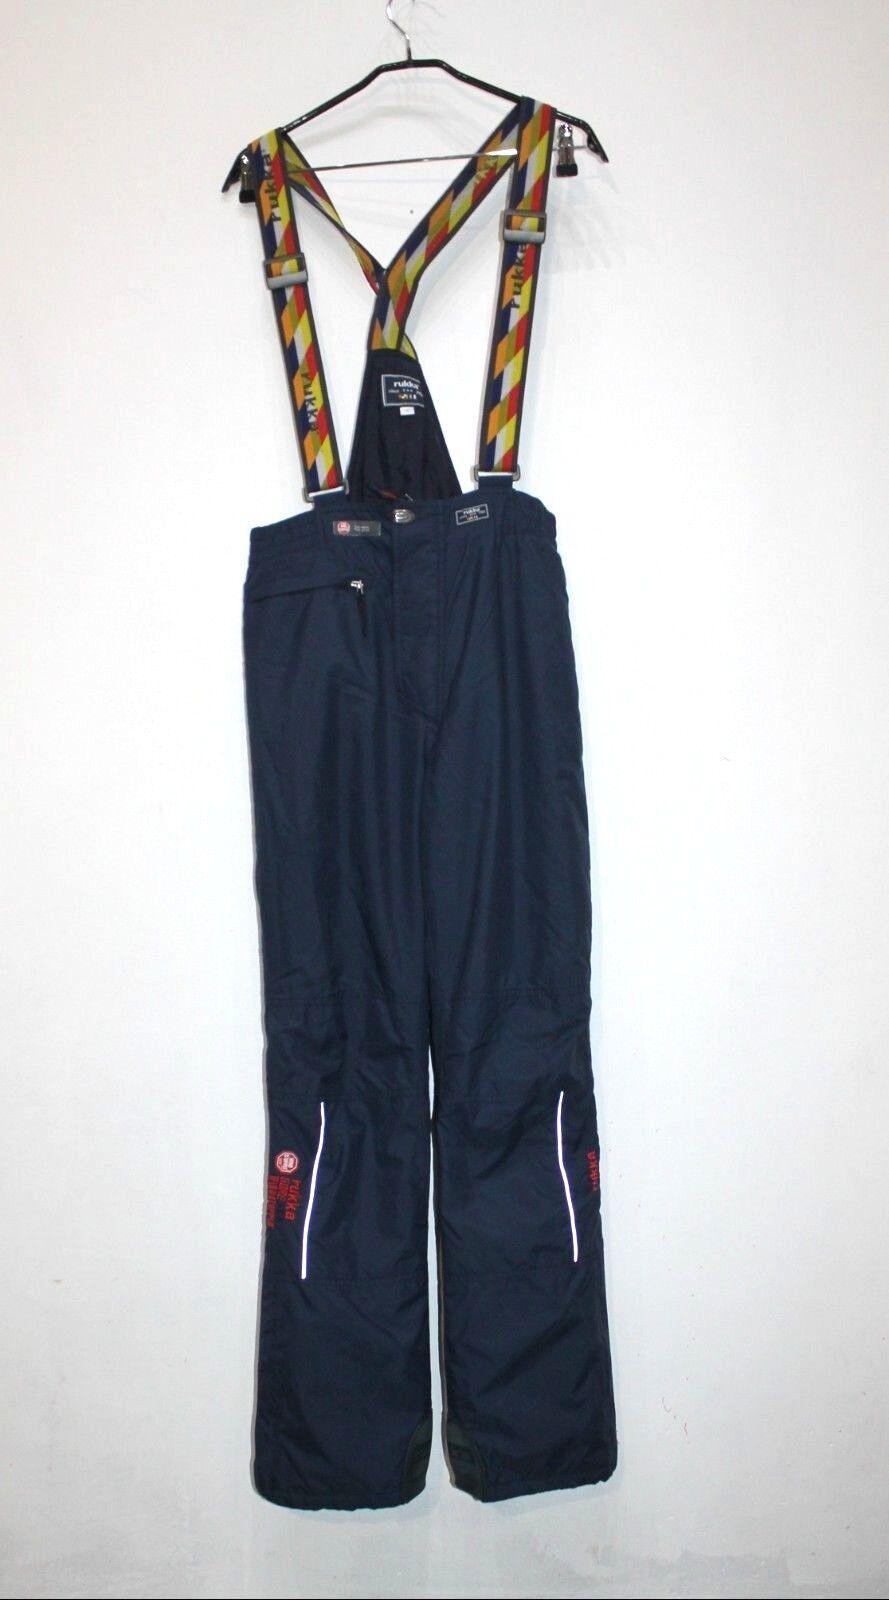 RUKKA Gore Windstopper Ski Pants Snowboard Trousers Salopettes Skiing Snow S